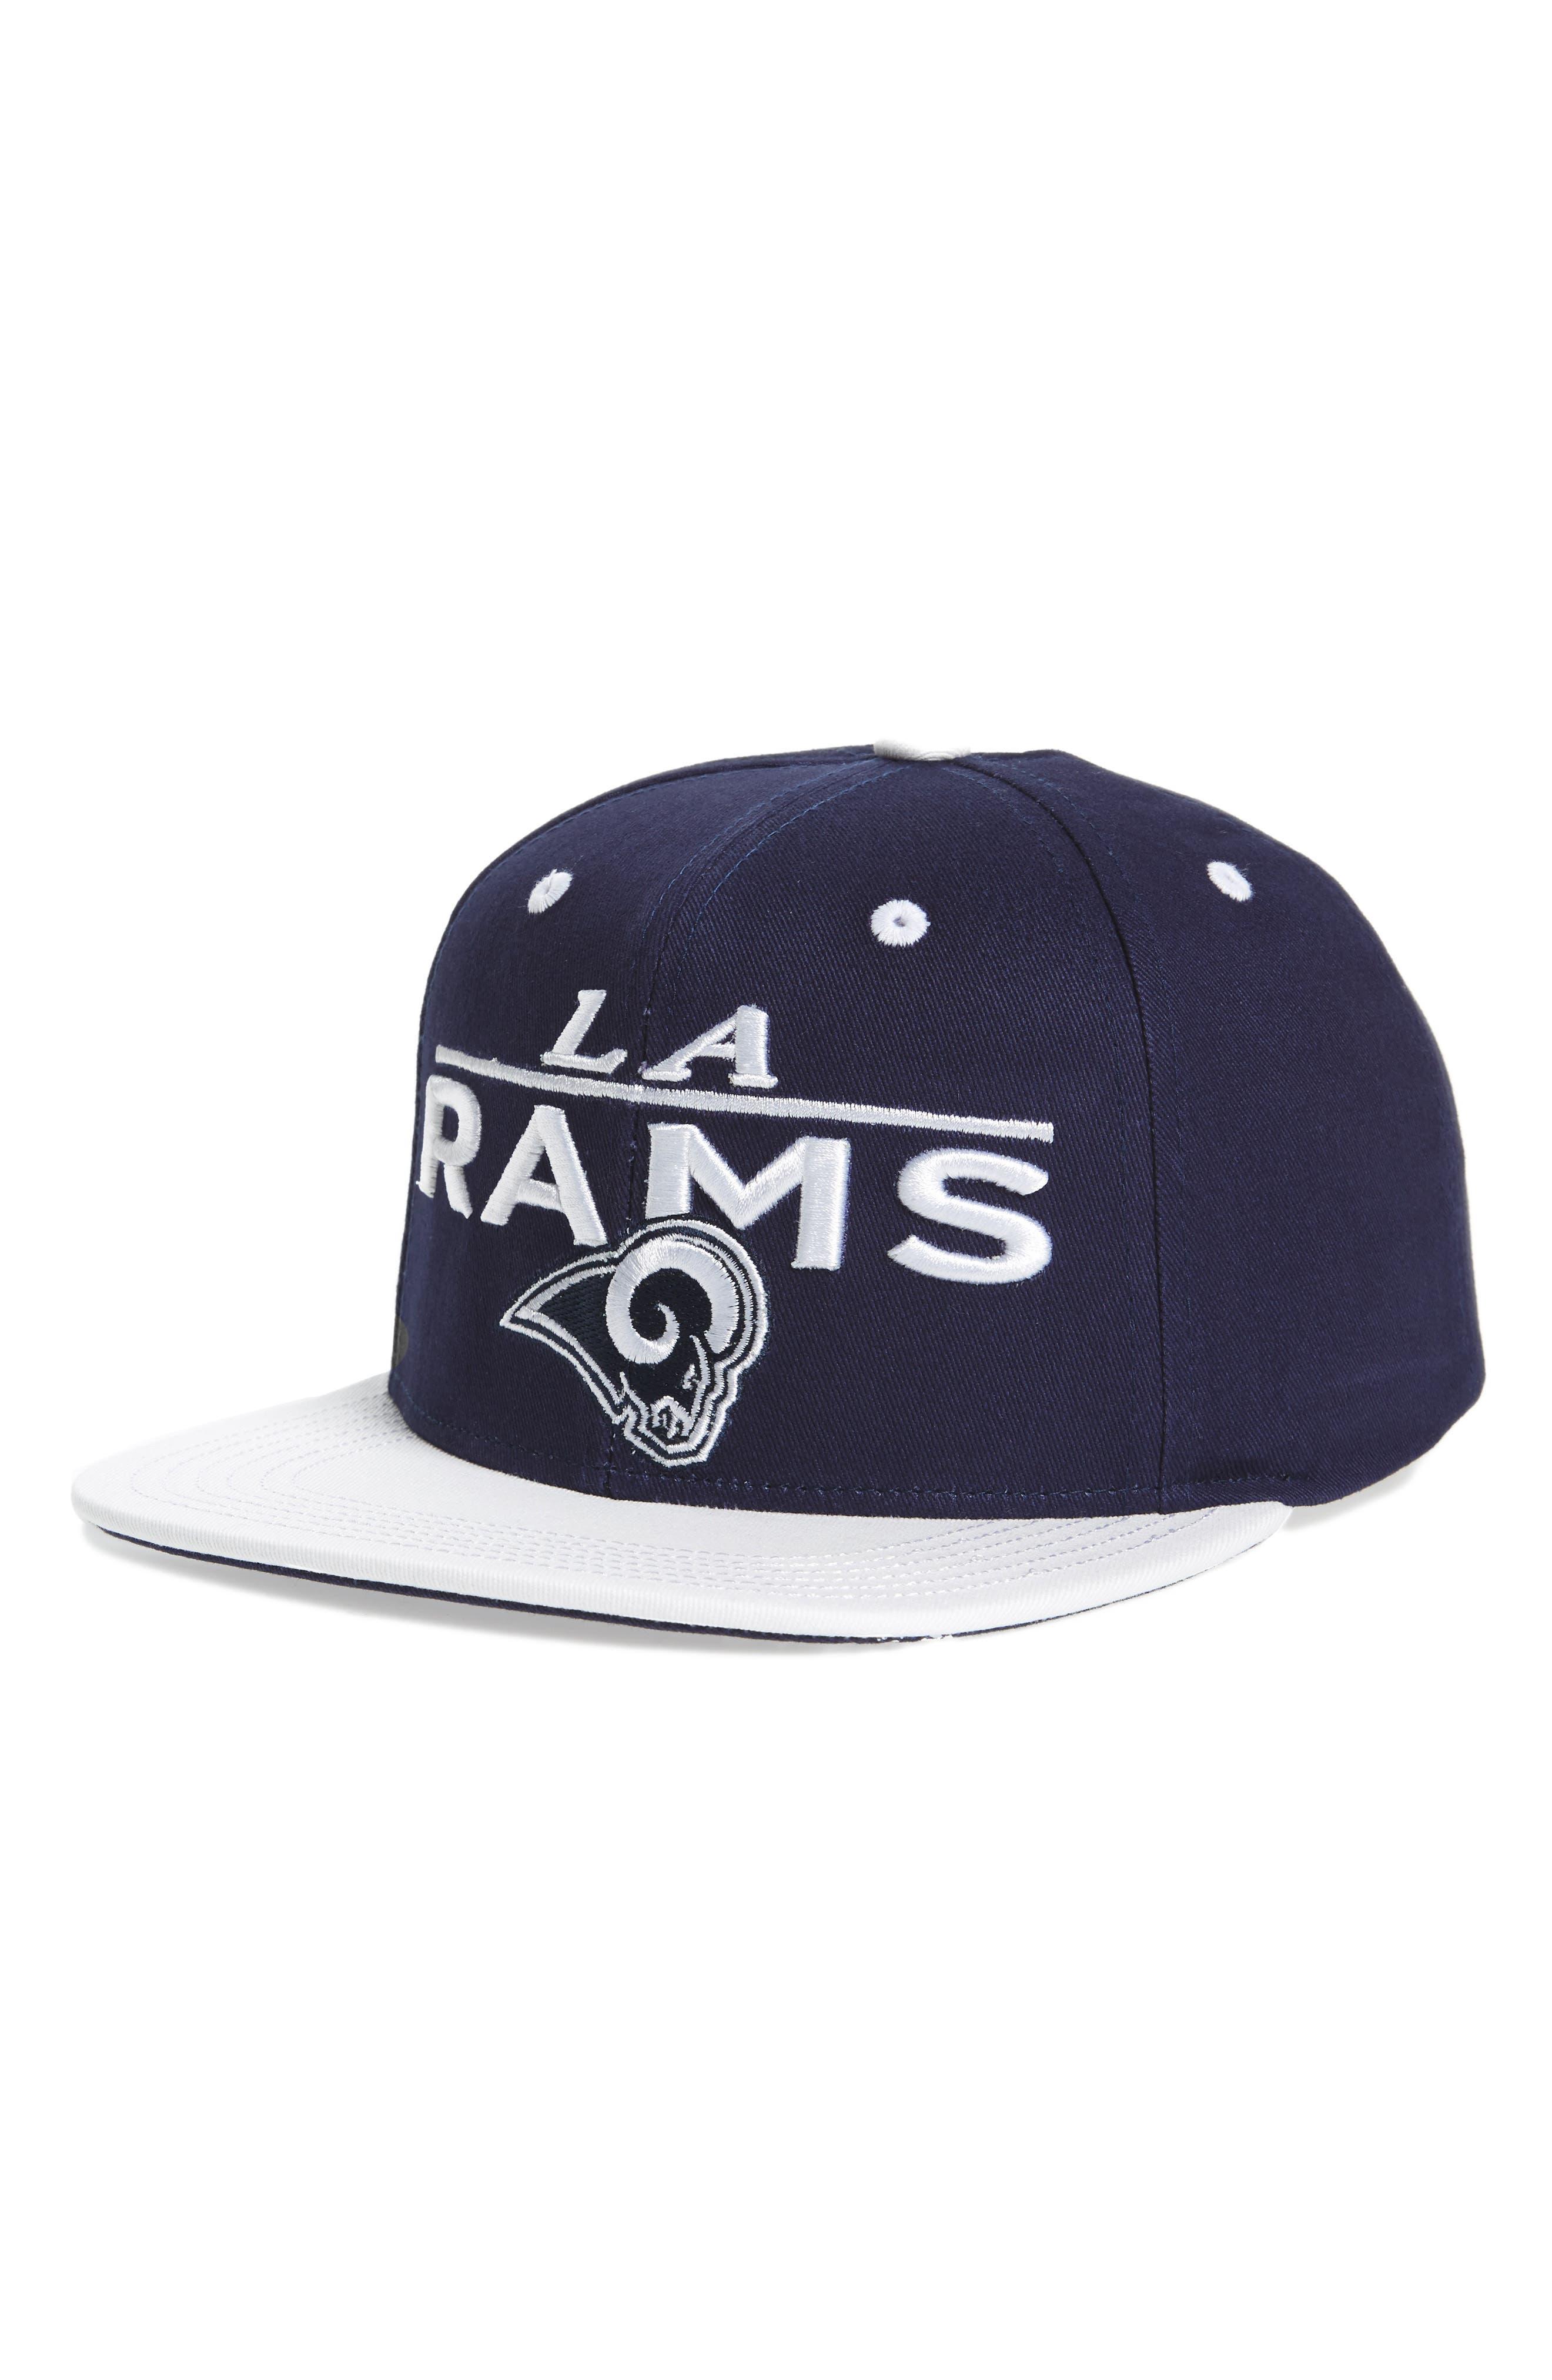 Alternate Image 1 Selected - NFL Logo Retro Bar Baseball Cap (Kids)